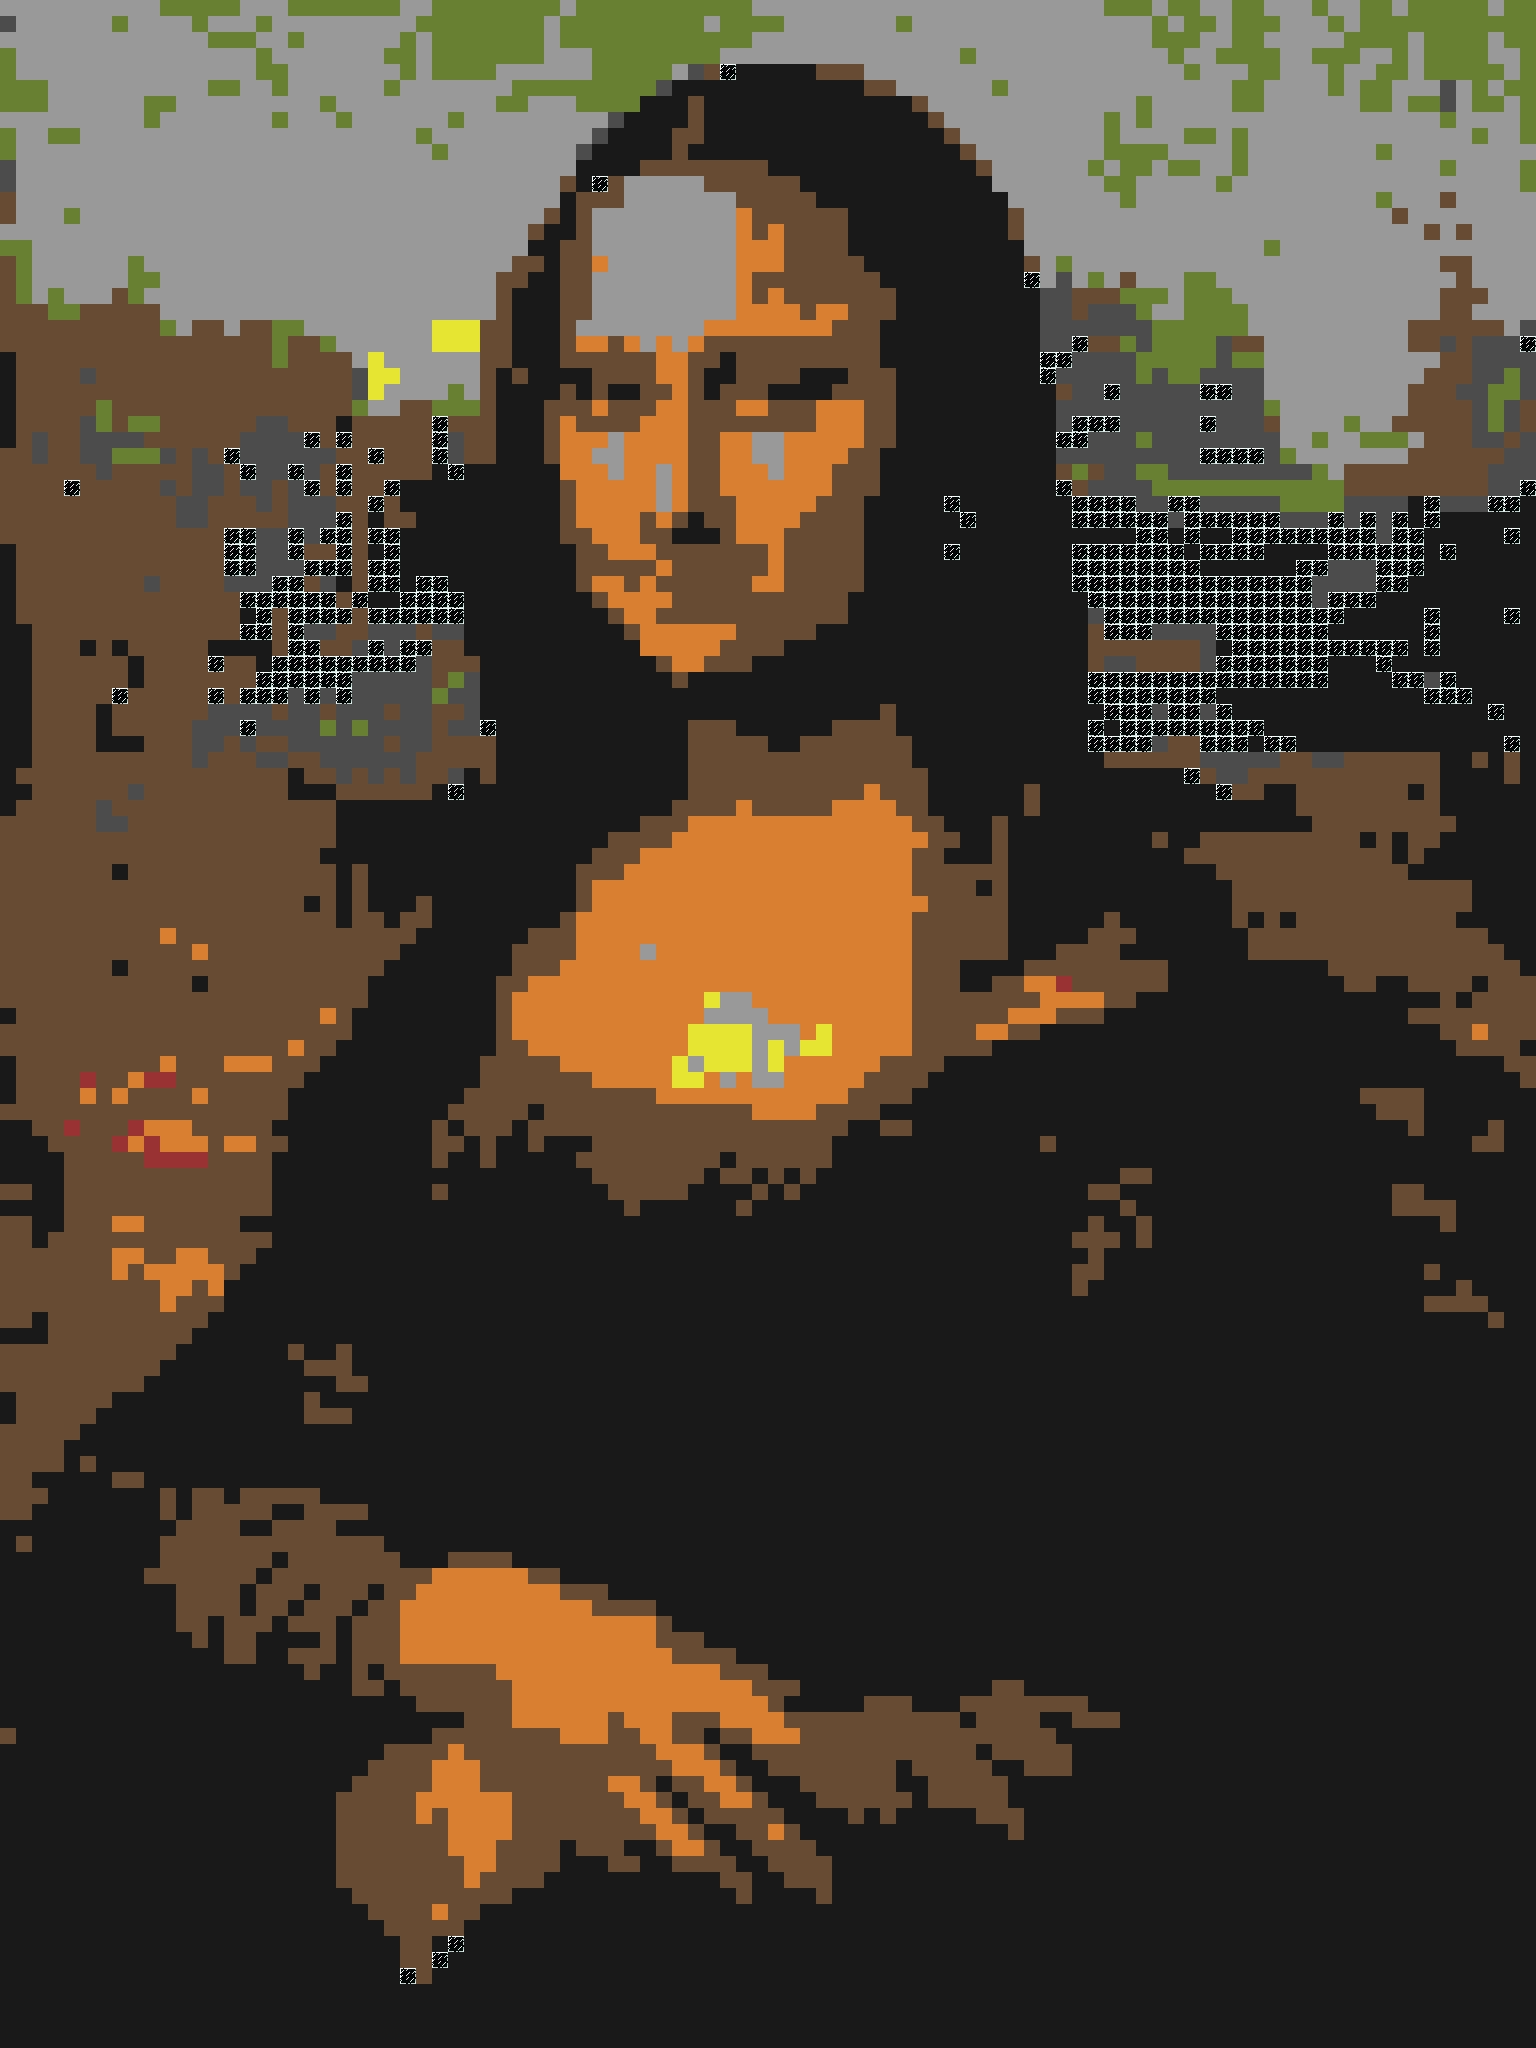 minecraft_dot (2).png